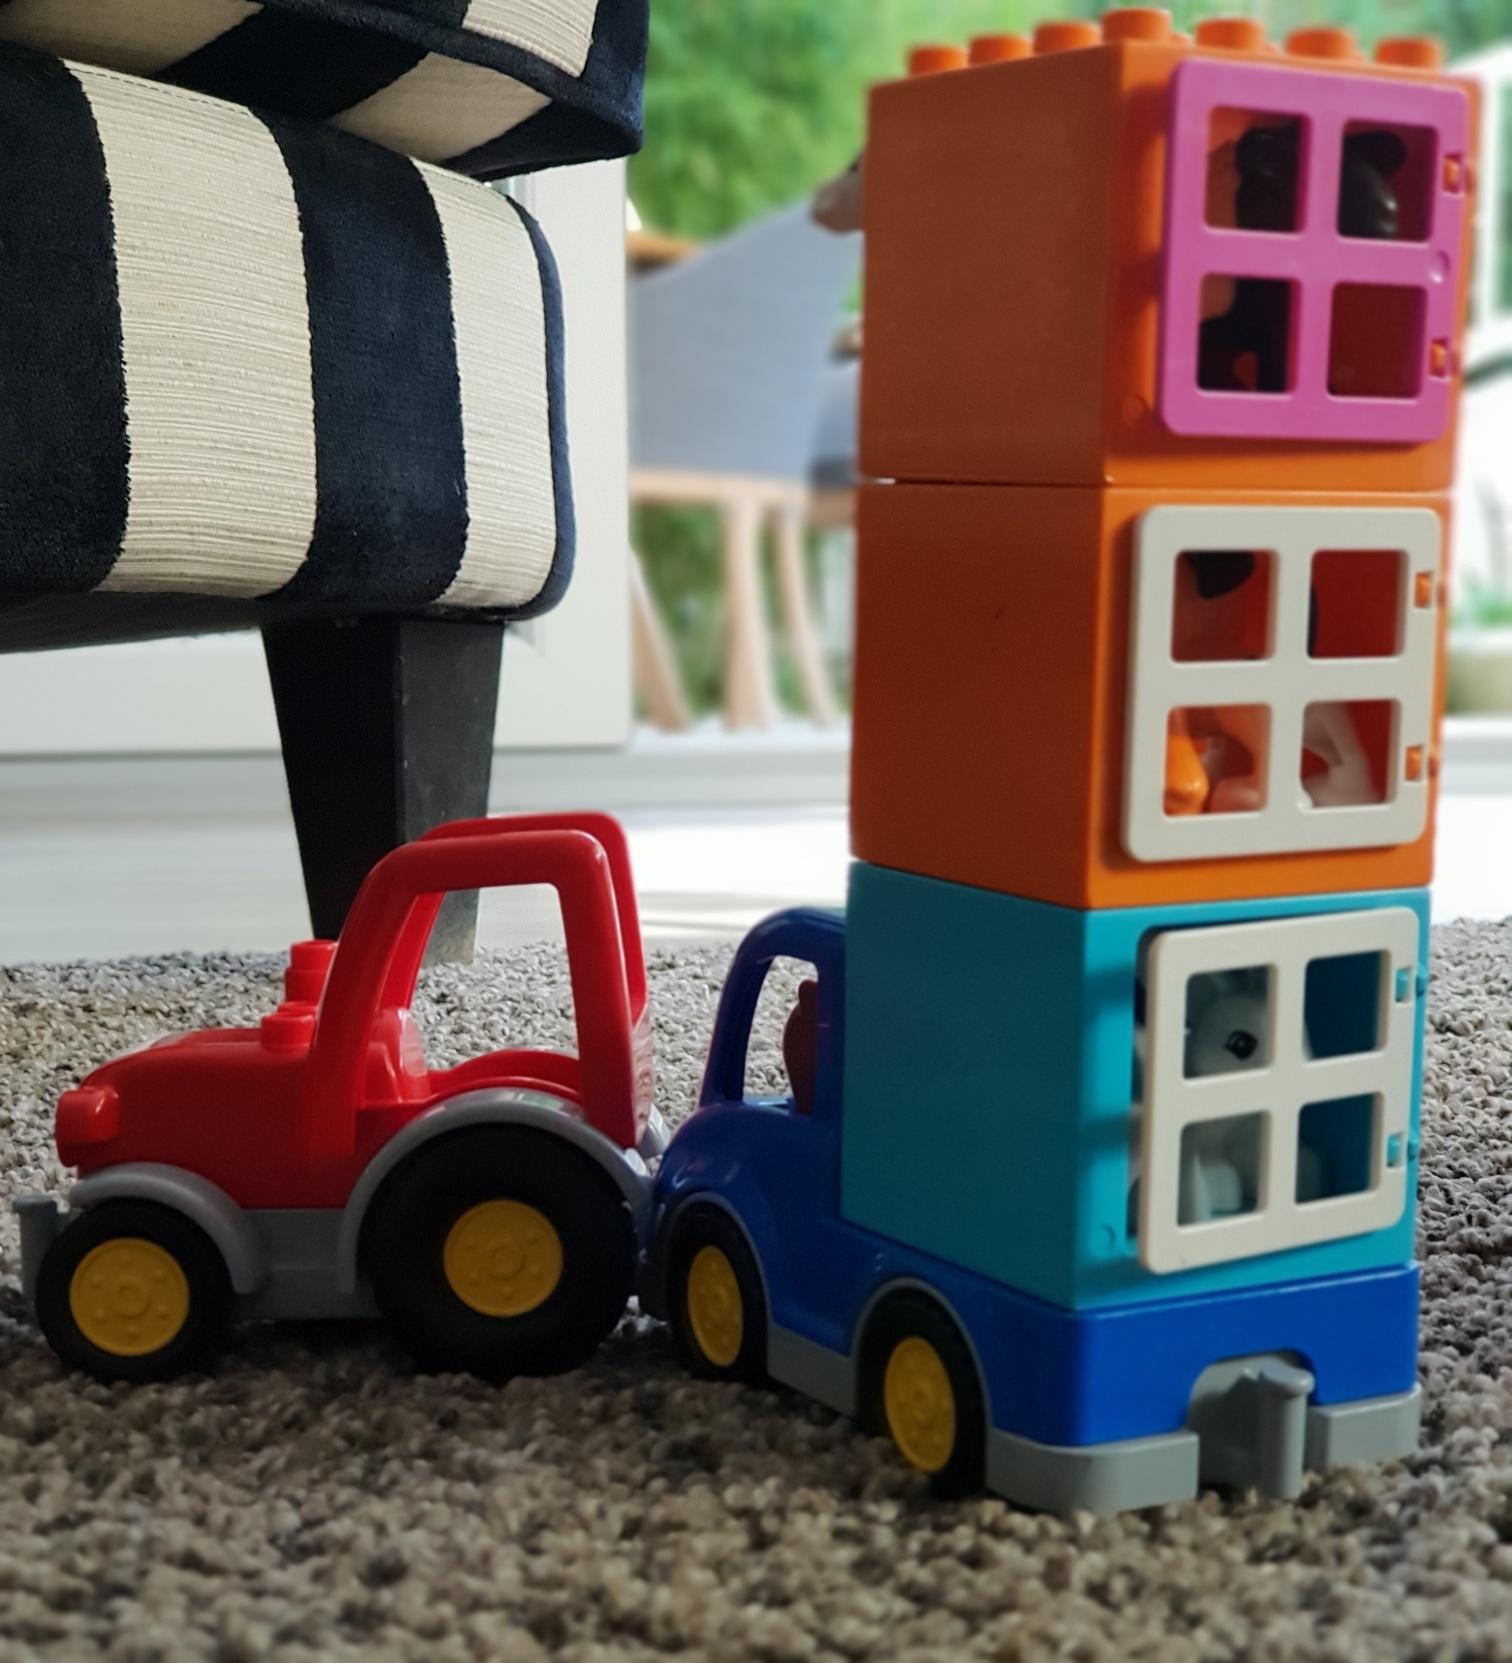 emeletes traktor